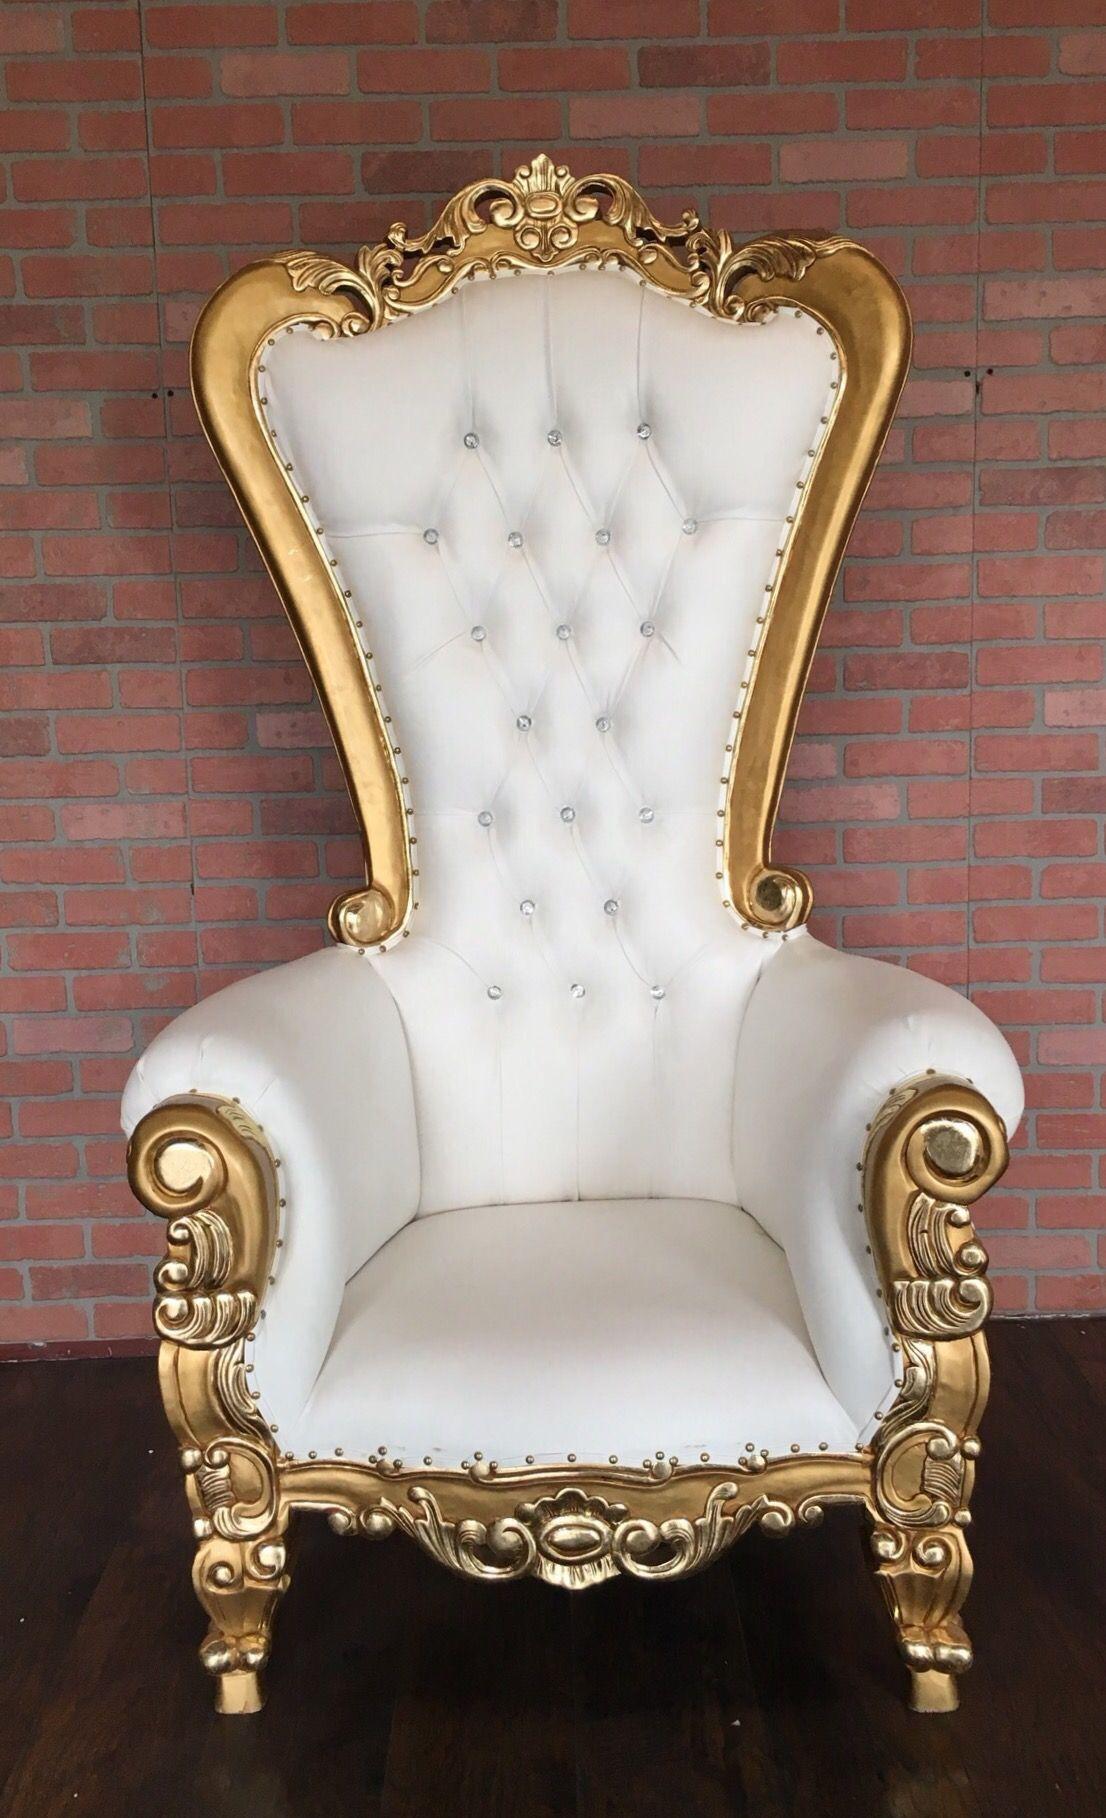 Luxurious Seating In 2019 Throne Chair Chair Royal Chair